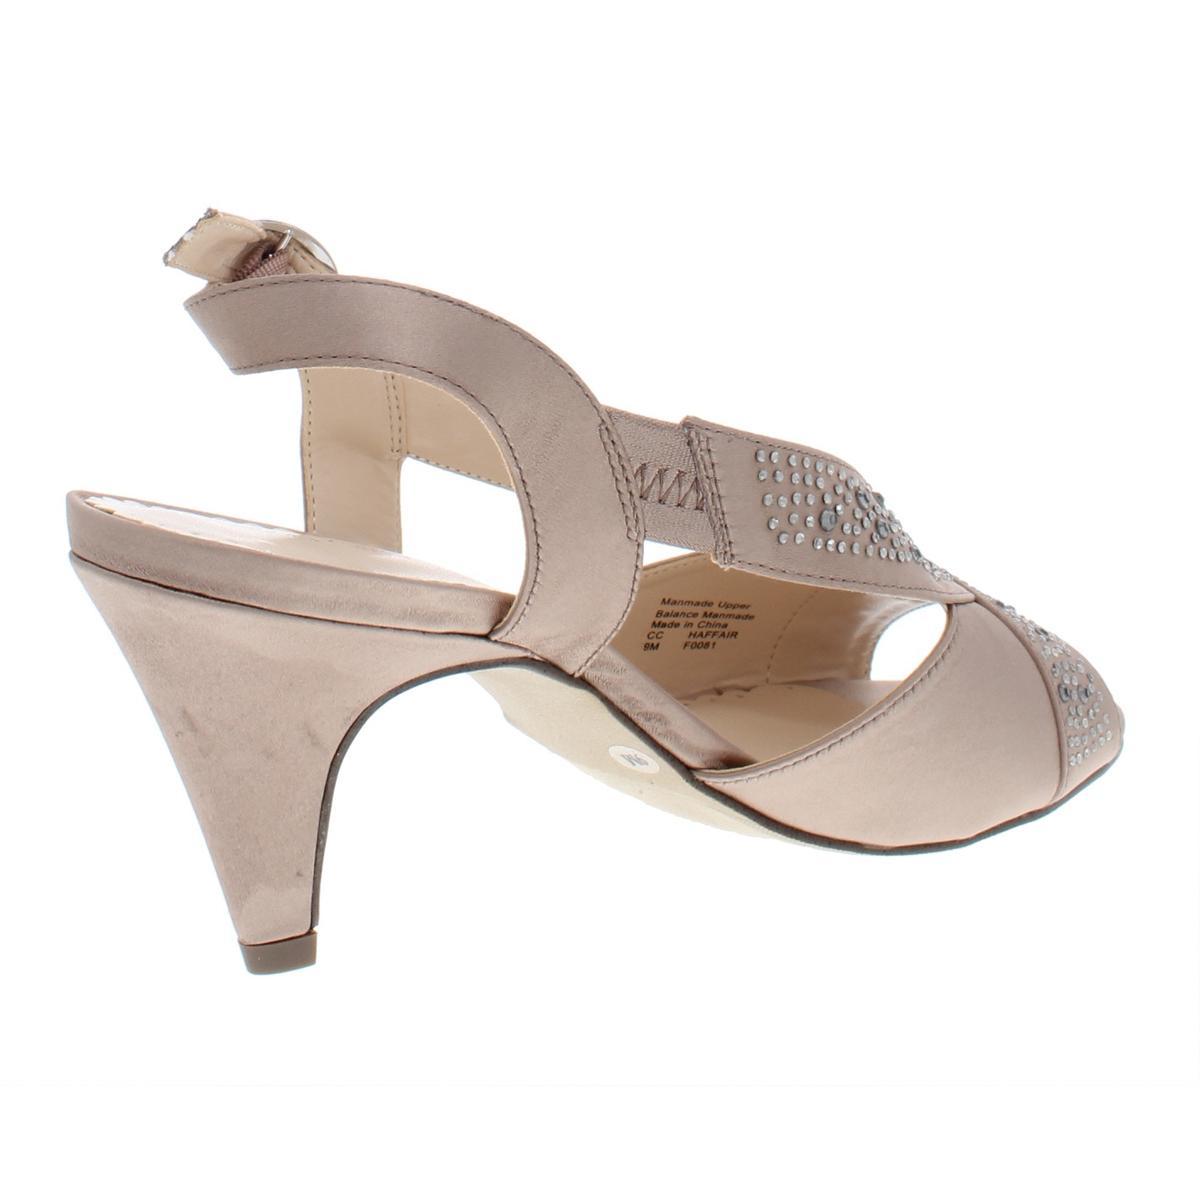 Charter-Club-Womens-Haffair-Satin-Heels-Dress-Sandals-Evening-BHFO-6807 thumbnail 4